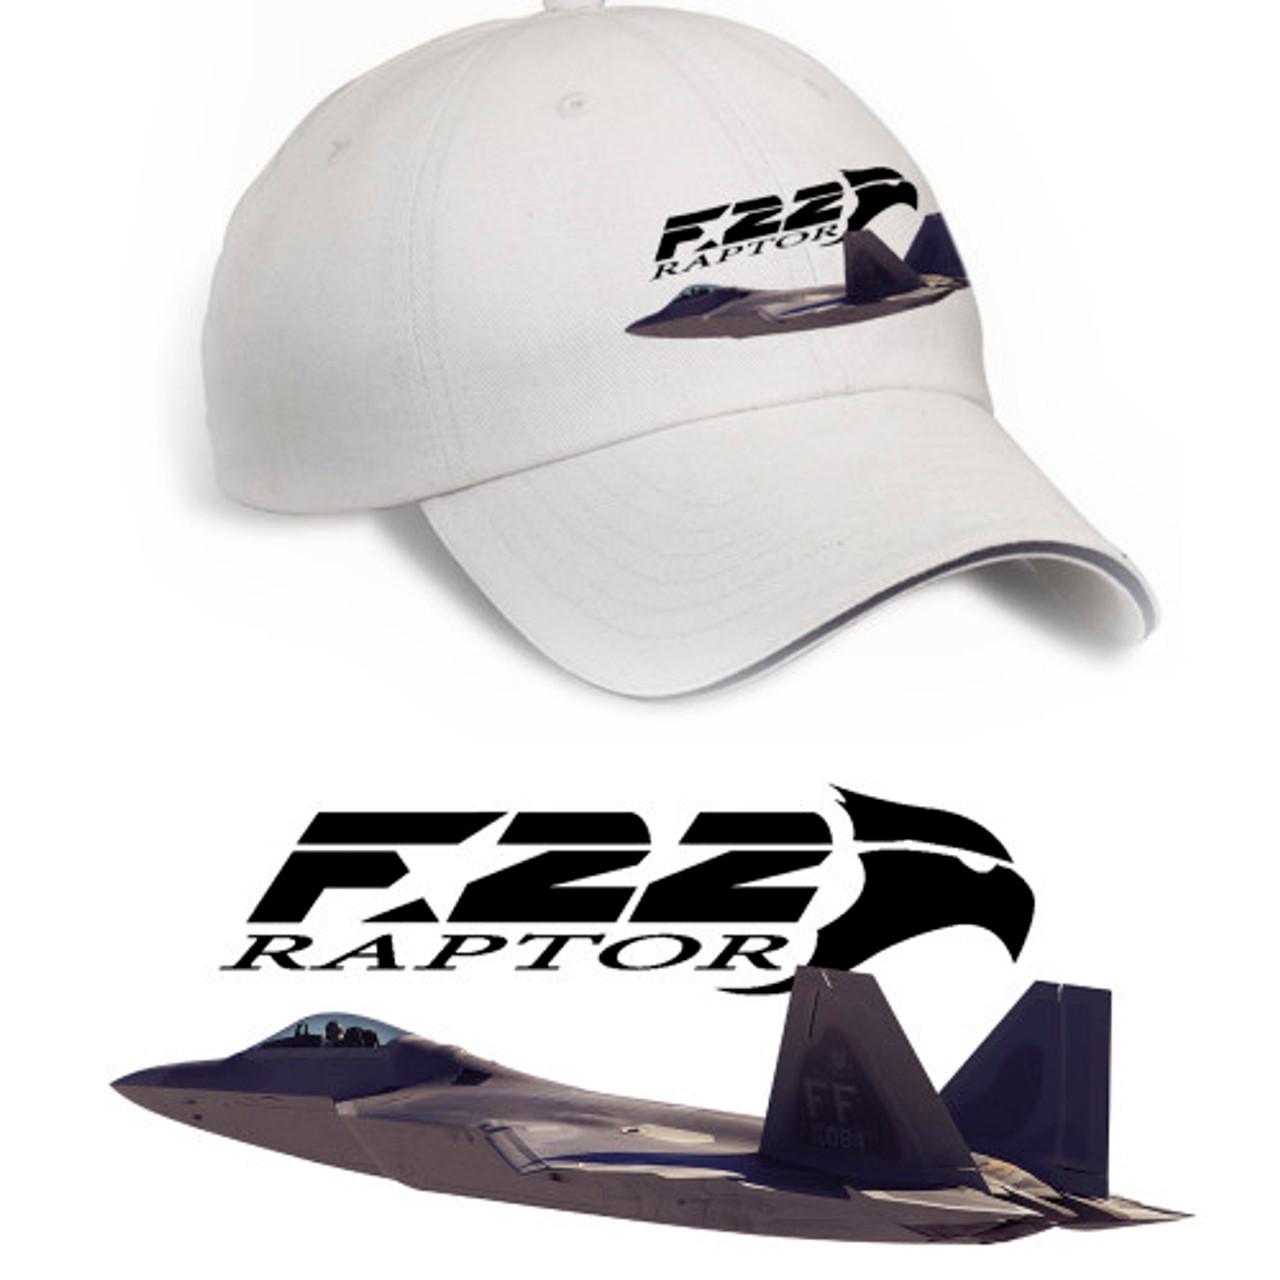 F-22 Raptor Hat (Stone)